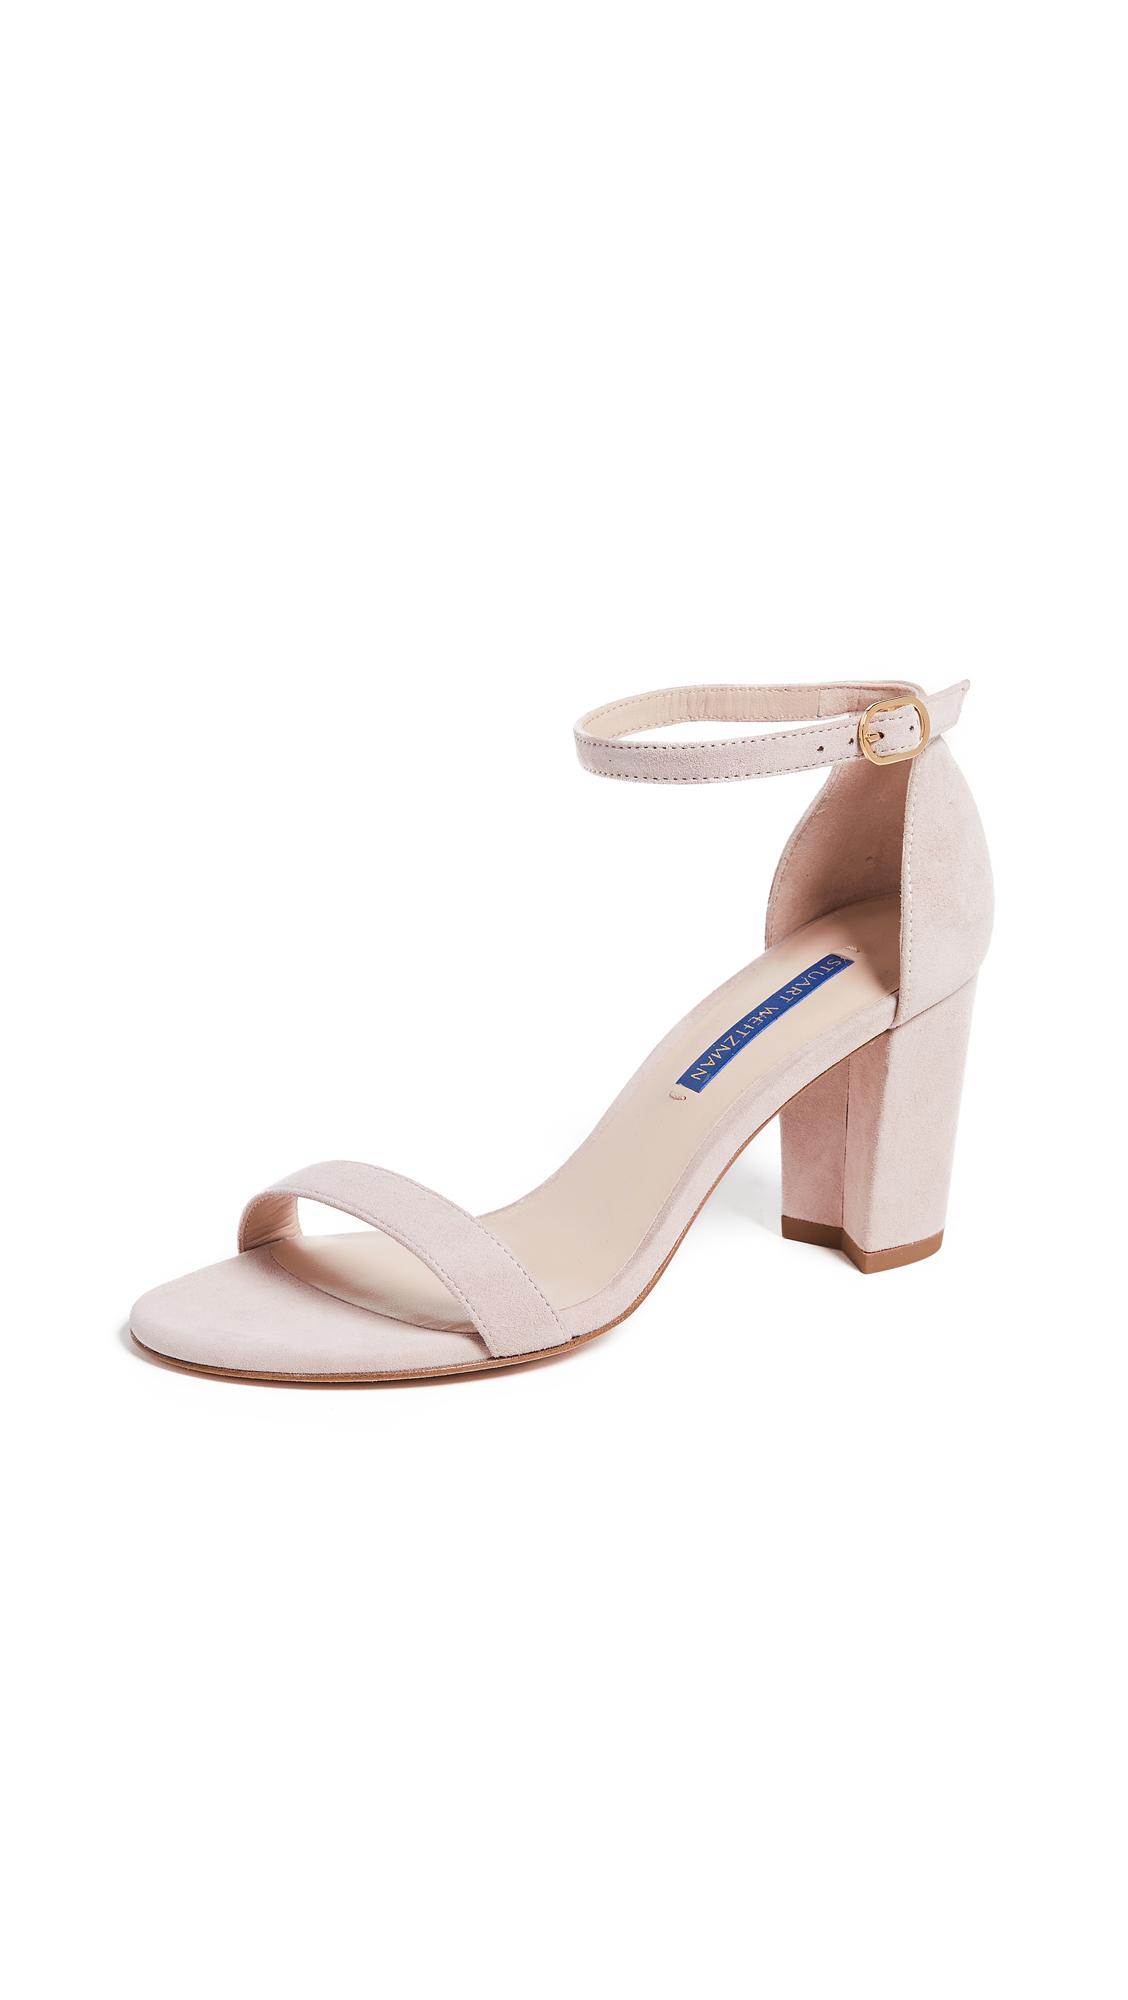 Stuart Weitzman Nearlynude Sandals - Dolce